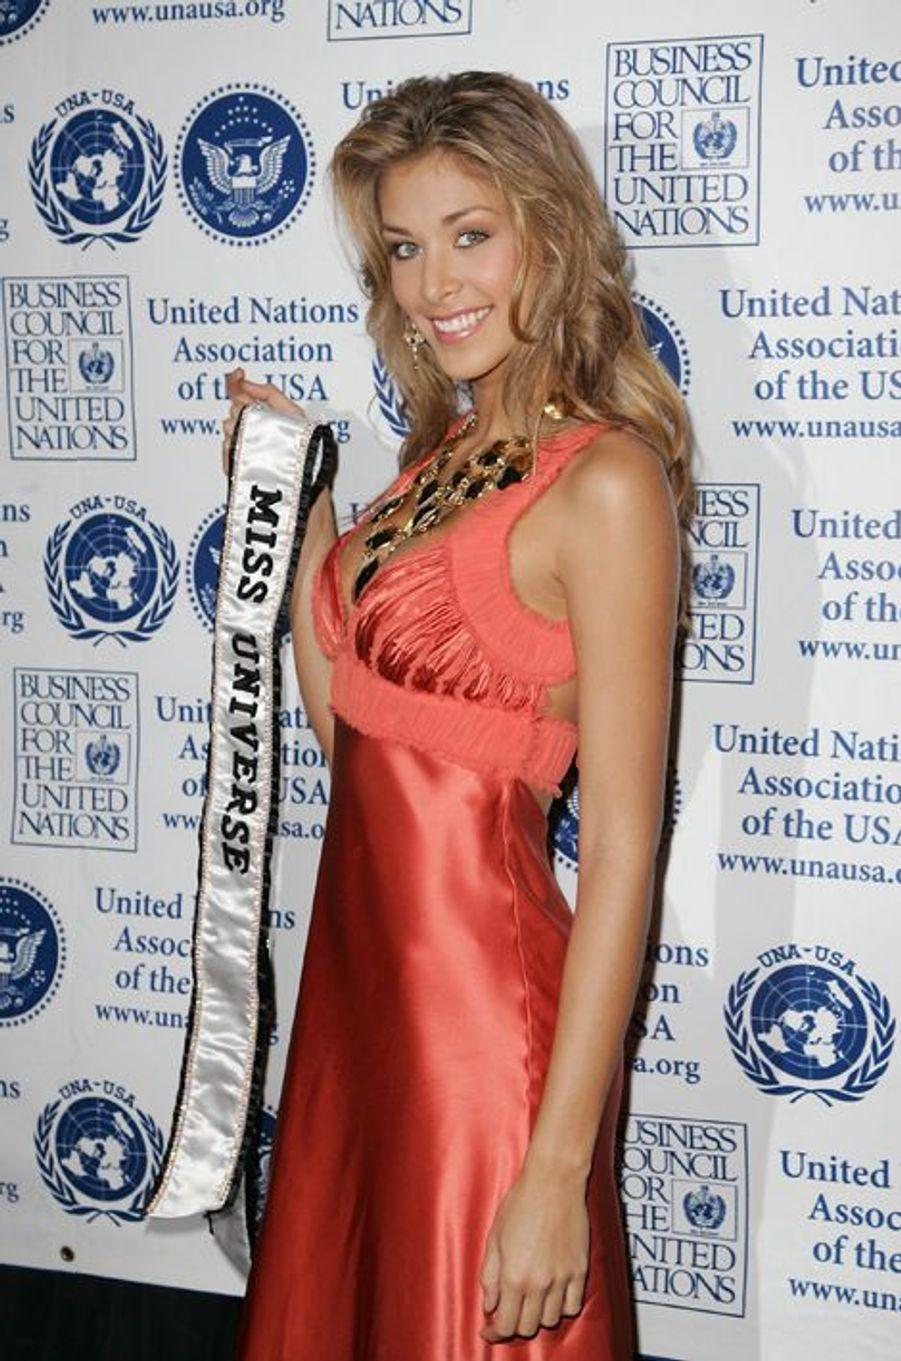 Dayana Mendoza, Miss Venezuela élue Miss Univers 2008